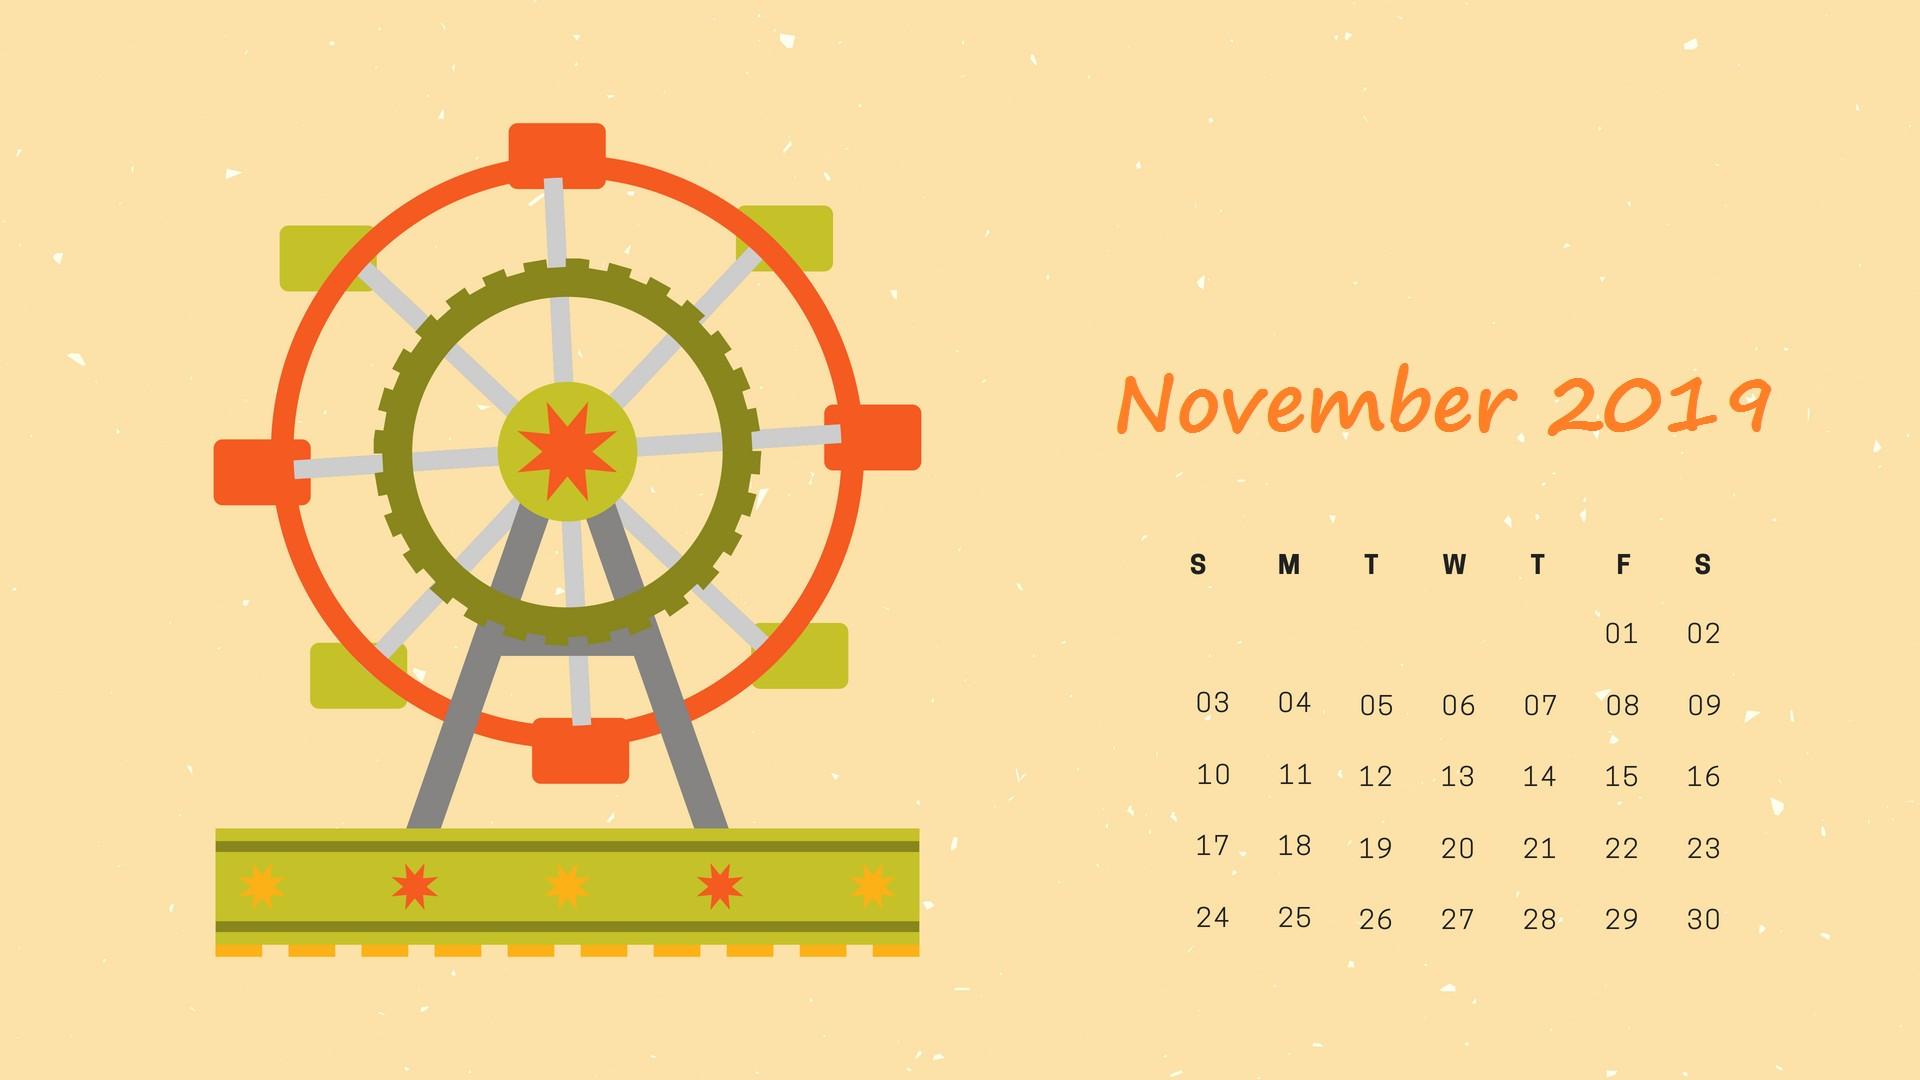 2019 November HD Calendar Wallpaper 2019calendar PrintableCalendar calendar2019 calendar CalendarTemplate